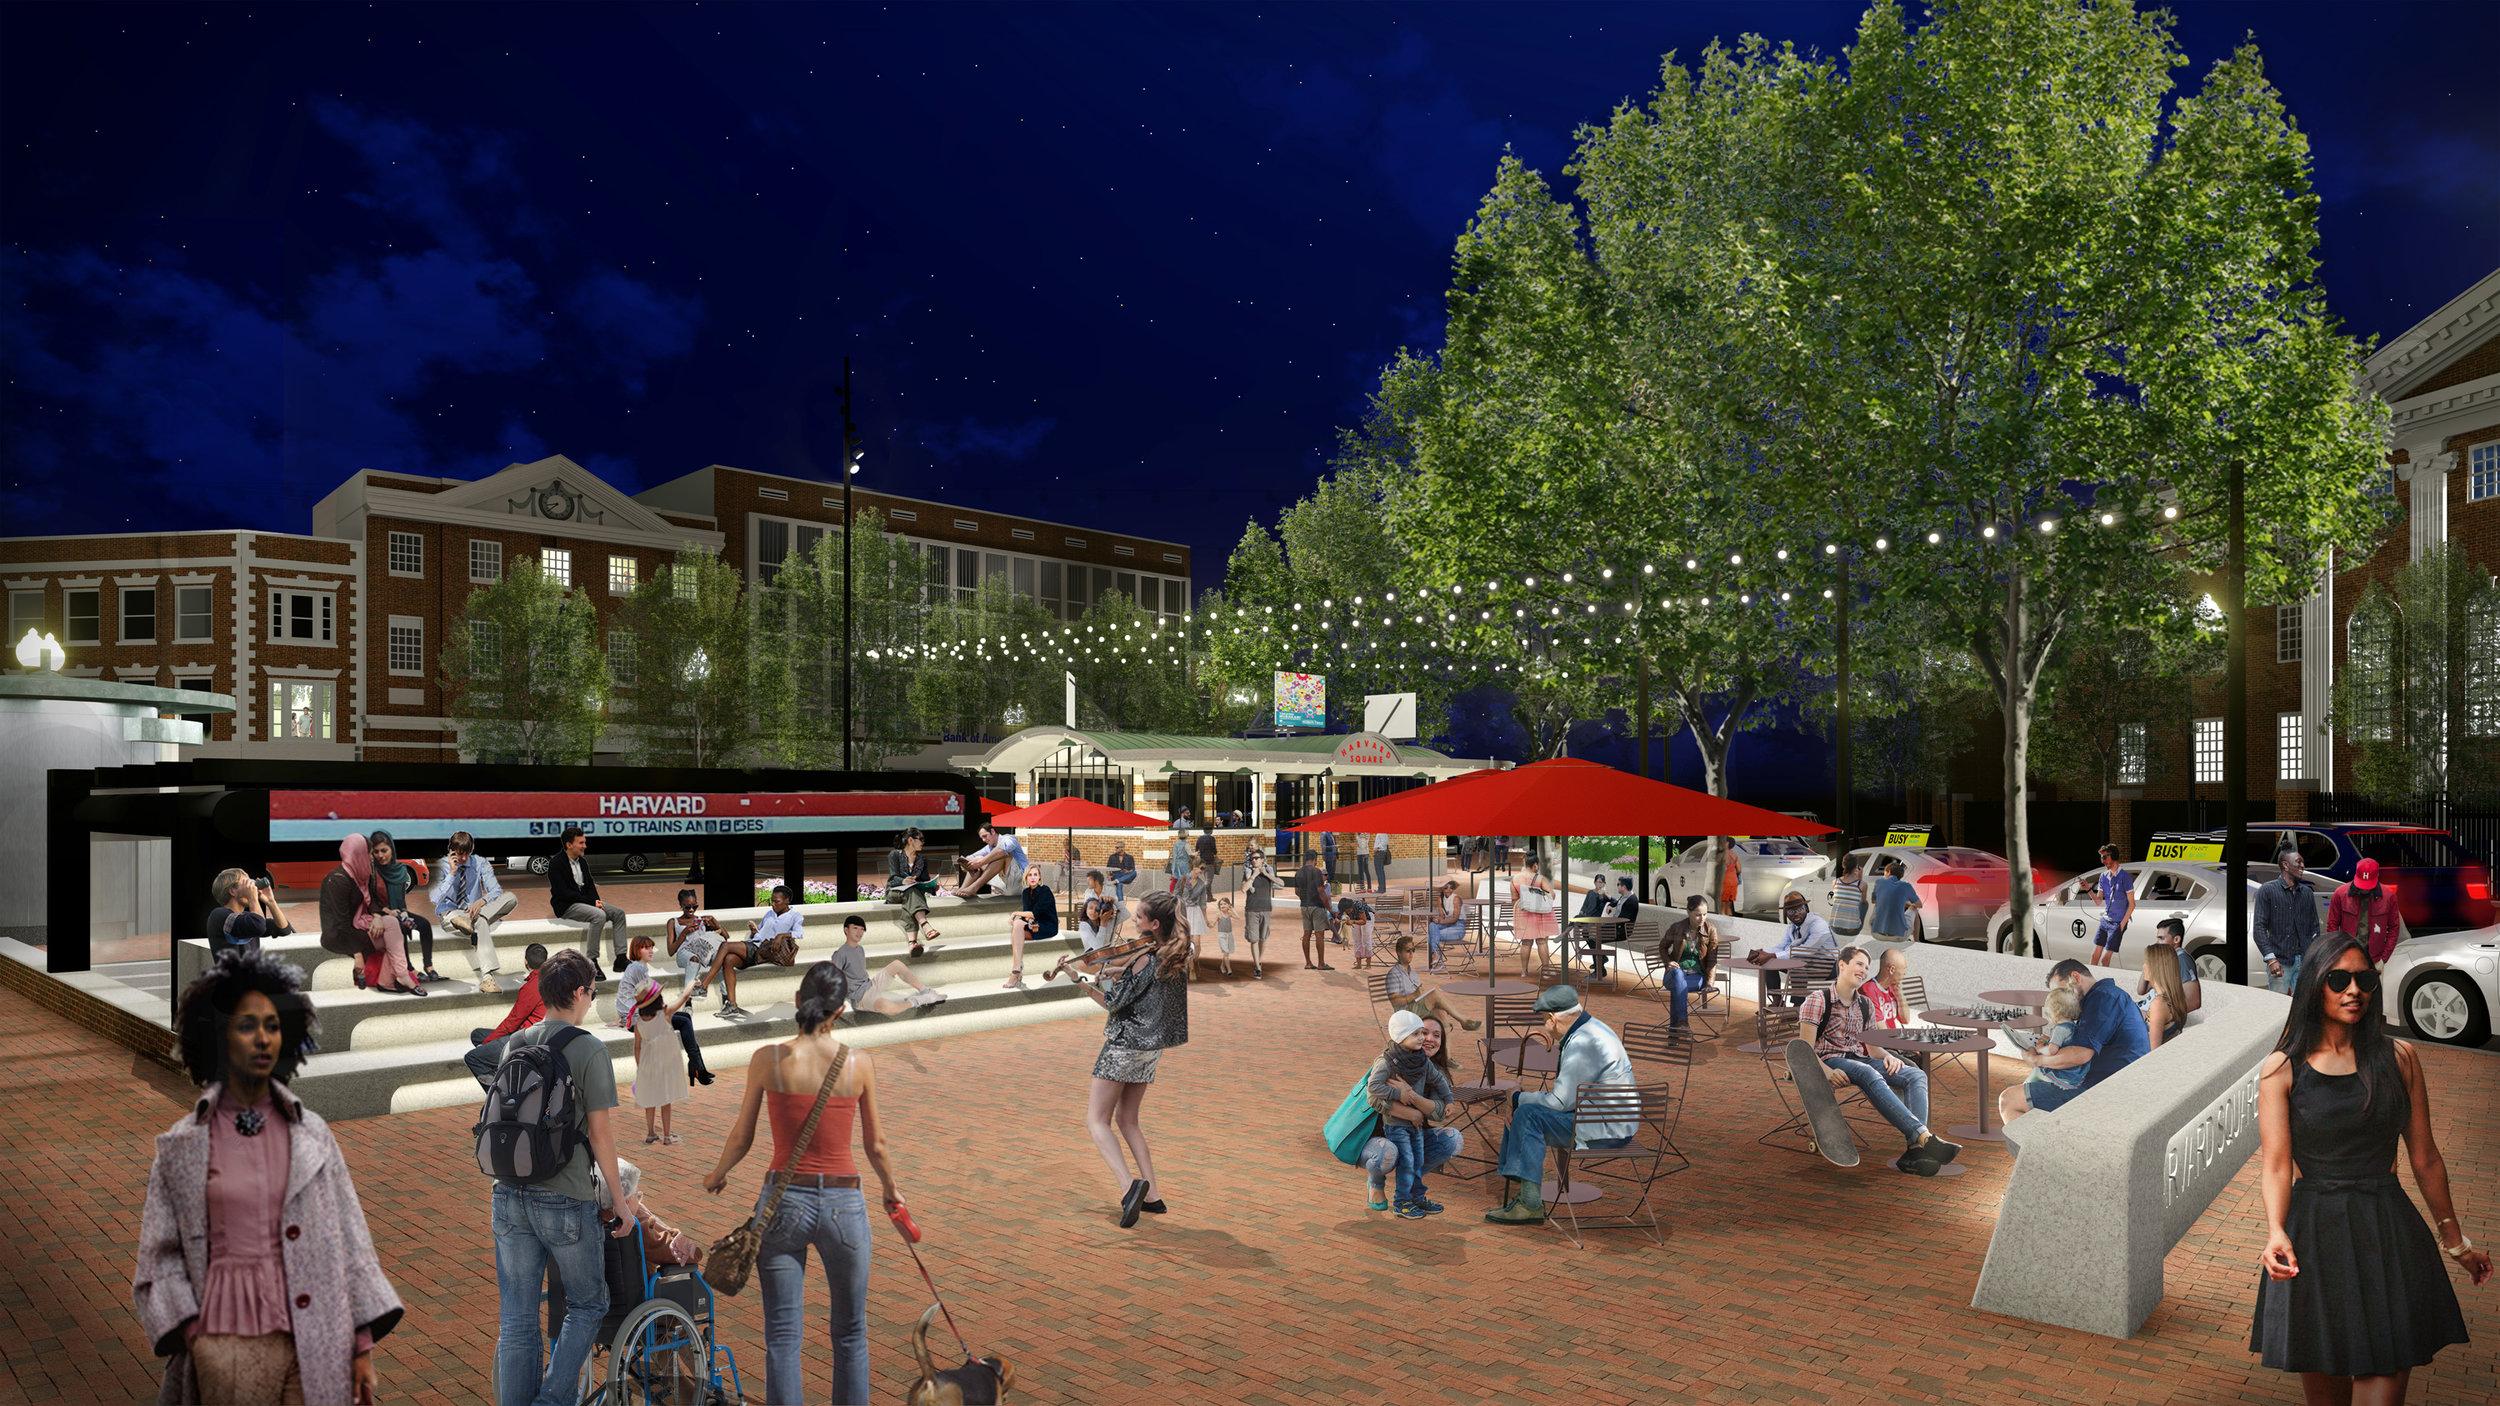 Reimagining the Heart of Harvard Square